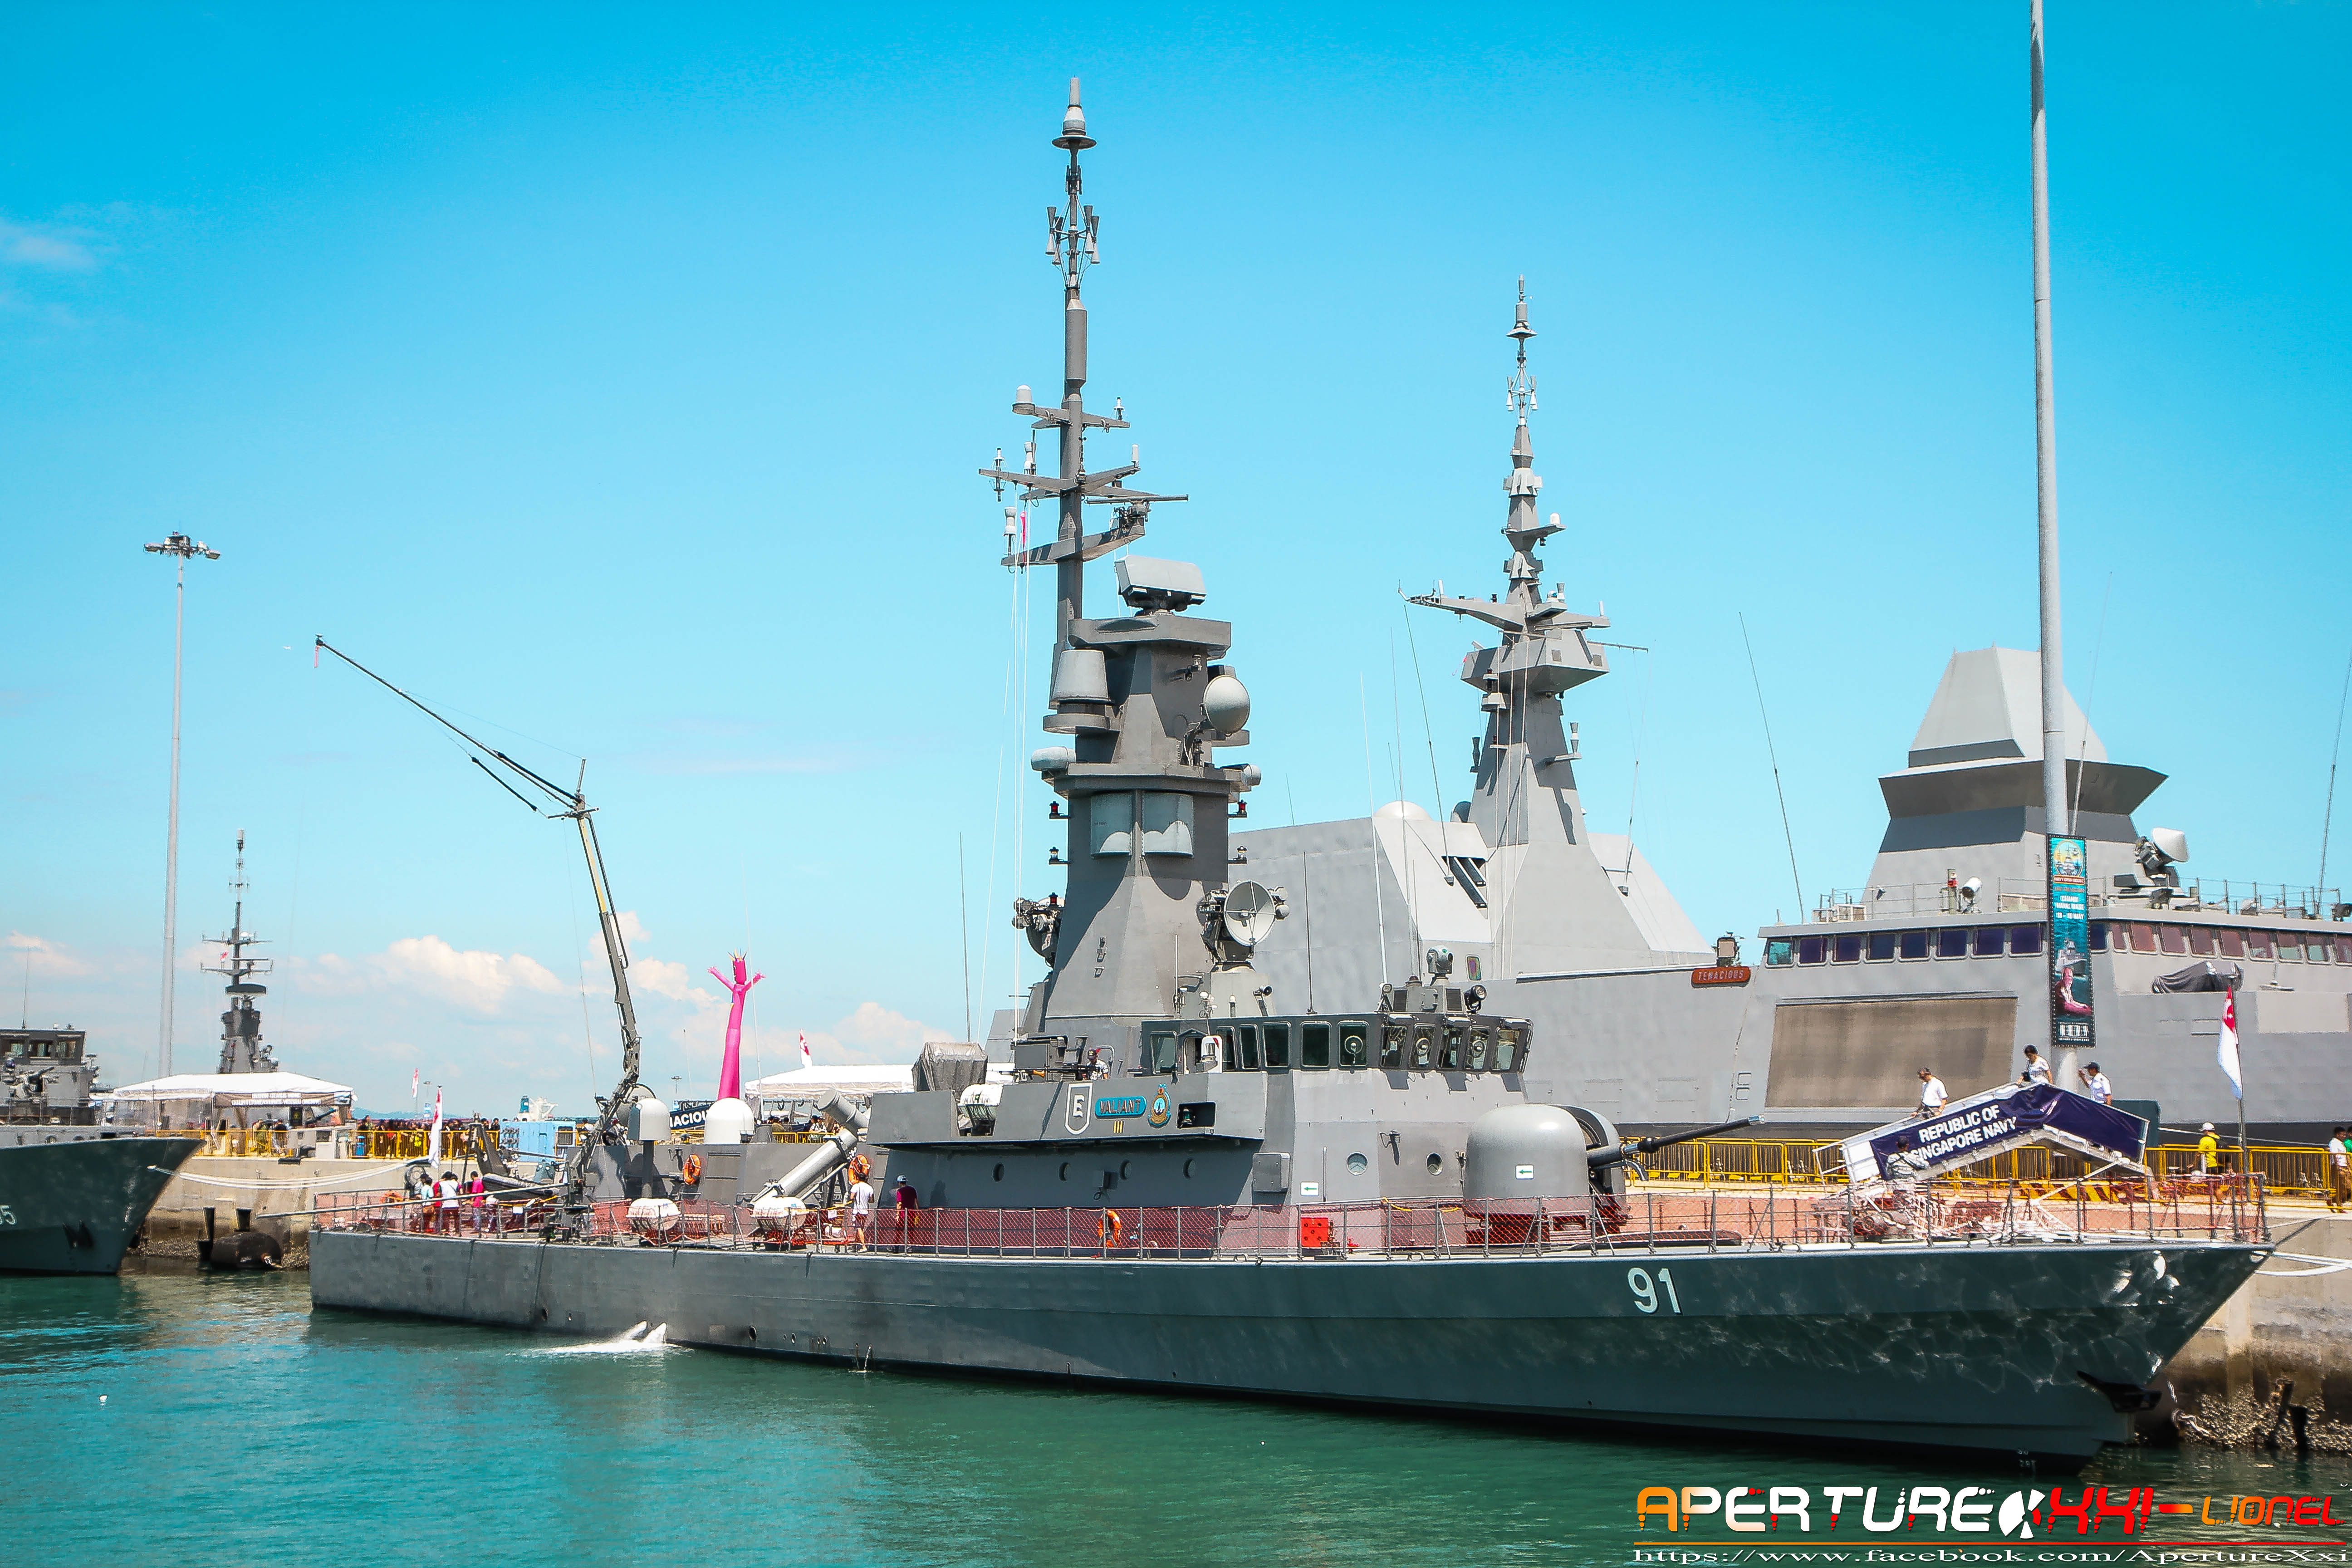 Singapore Navy - Marine de Singapour - Page 2 8865930783_0c569cb0b4_o